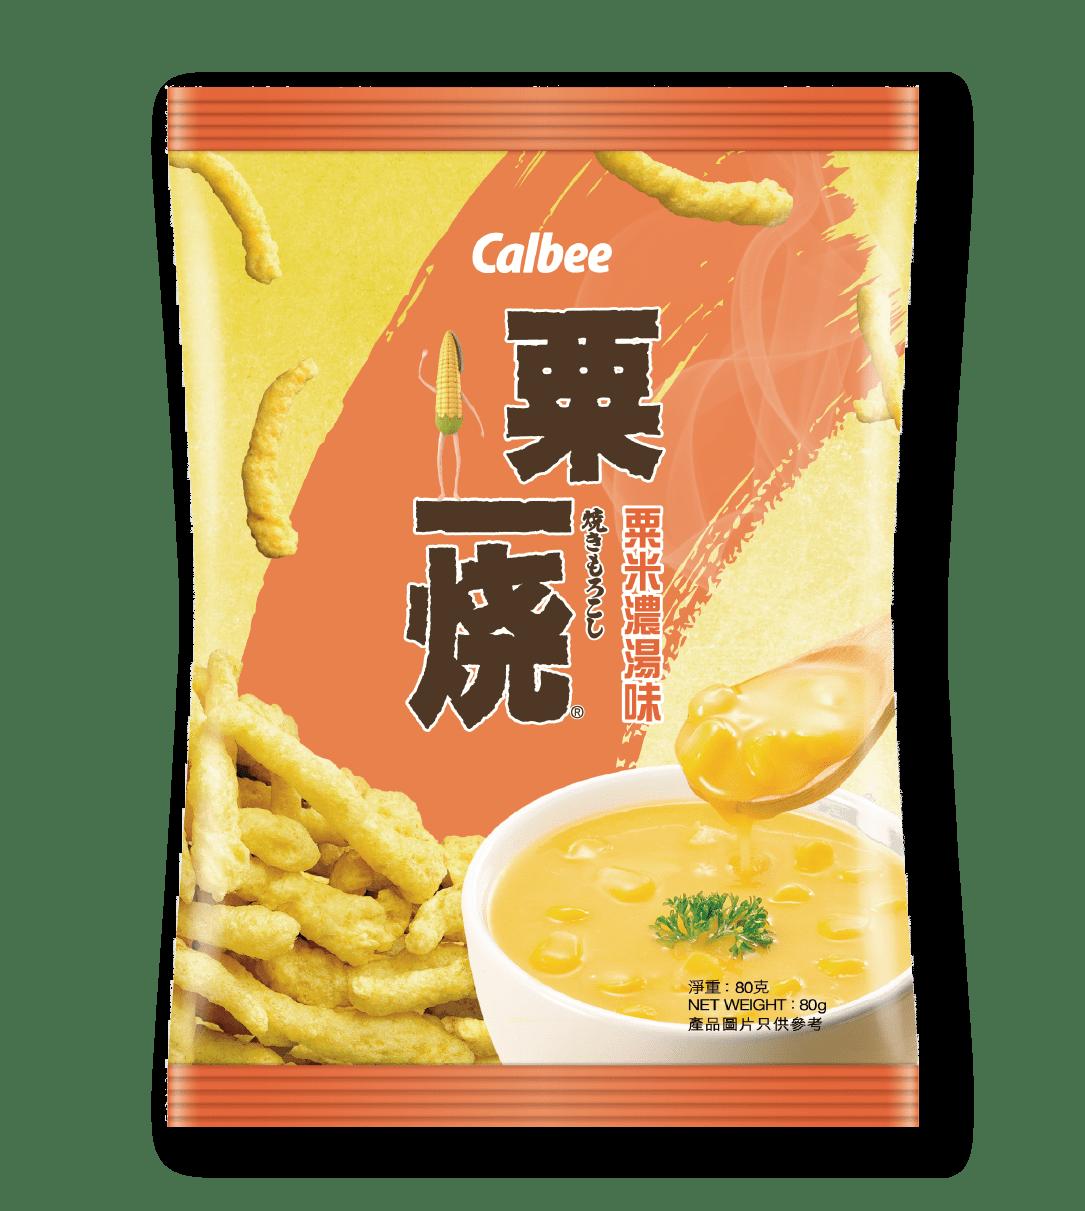 Calbee Australia - World Foods - Grill-A-Corn - Potage